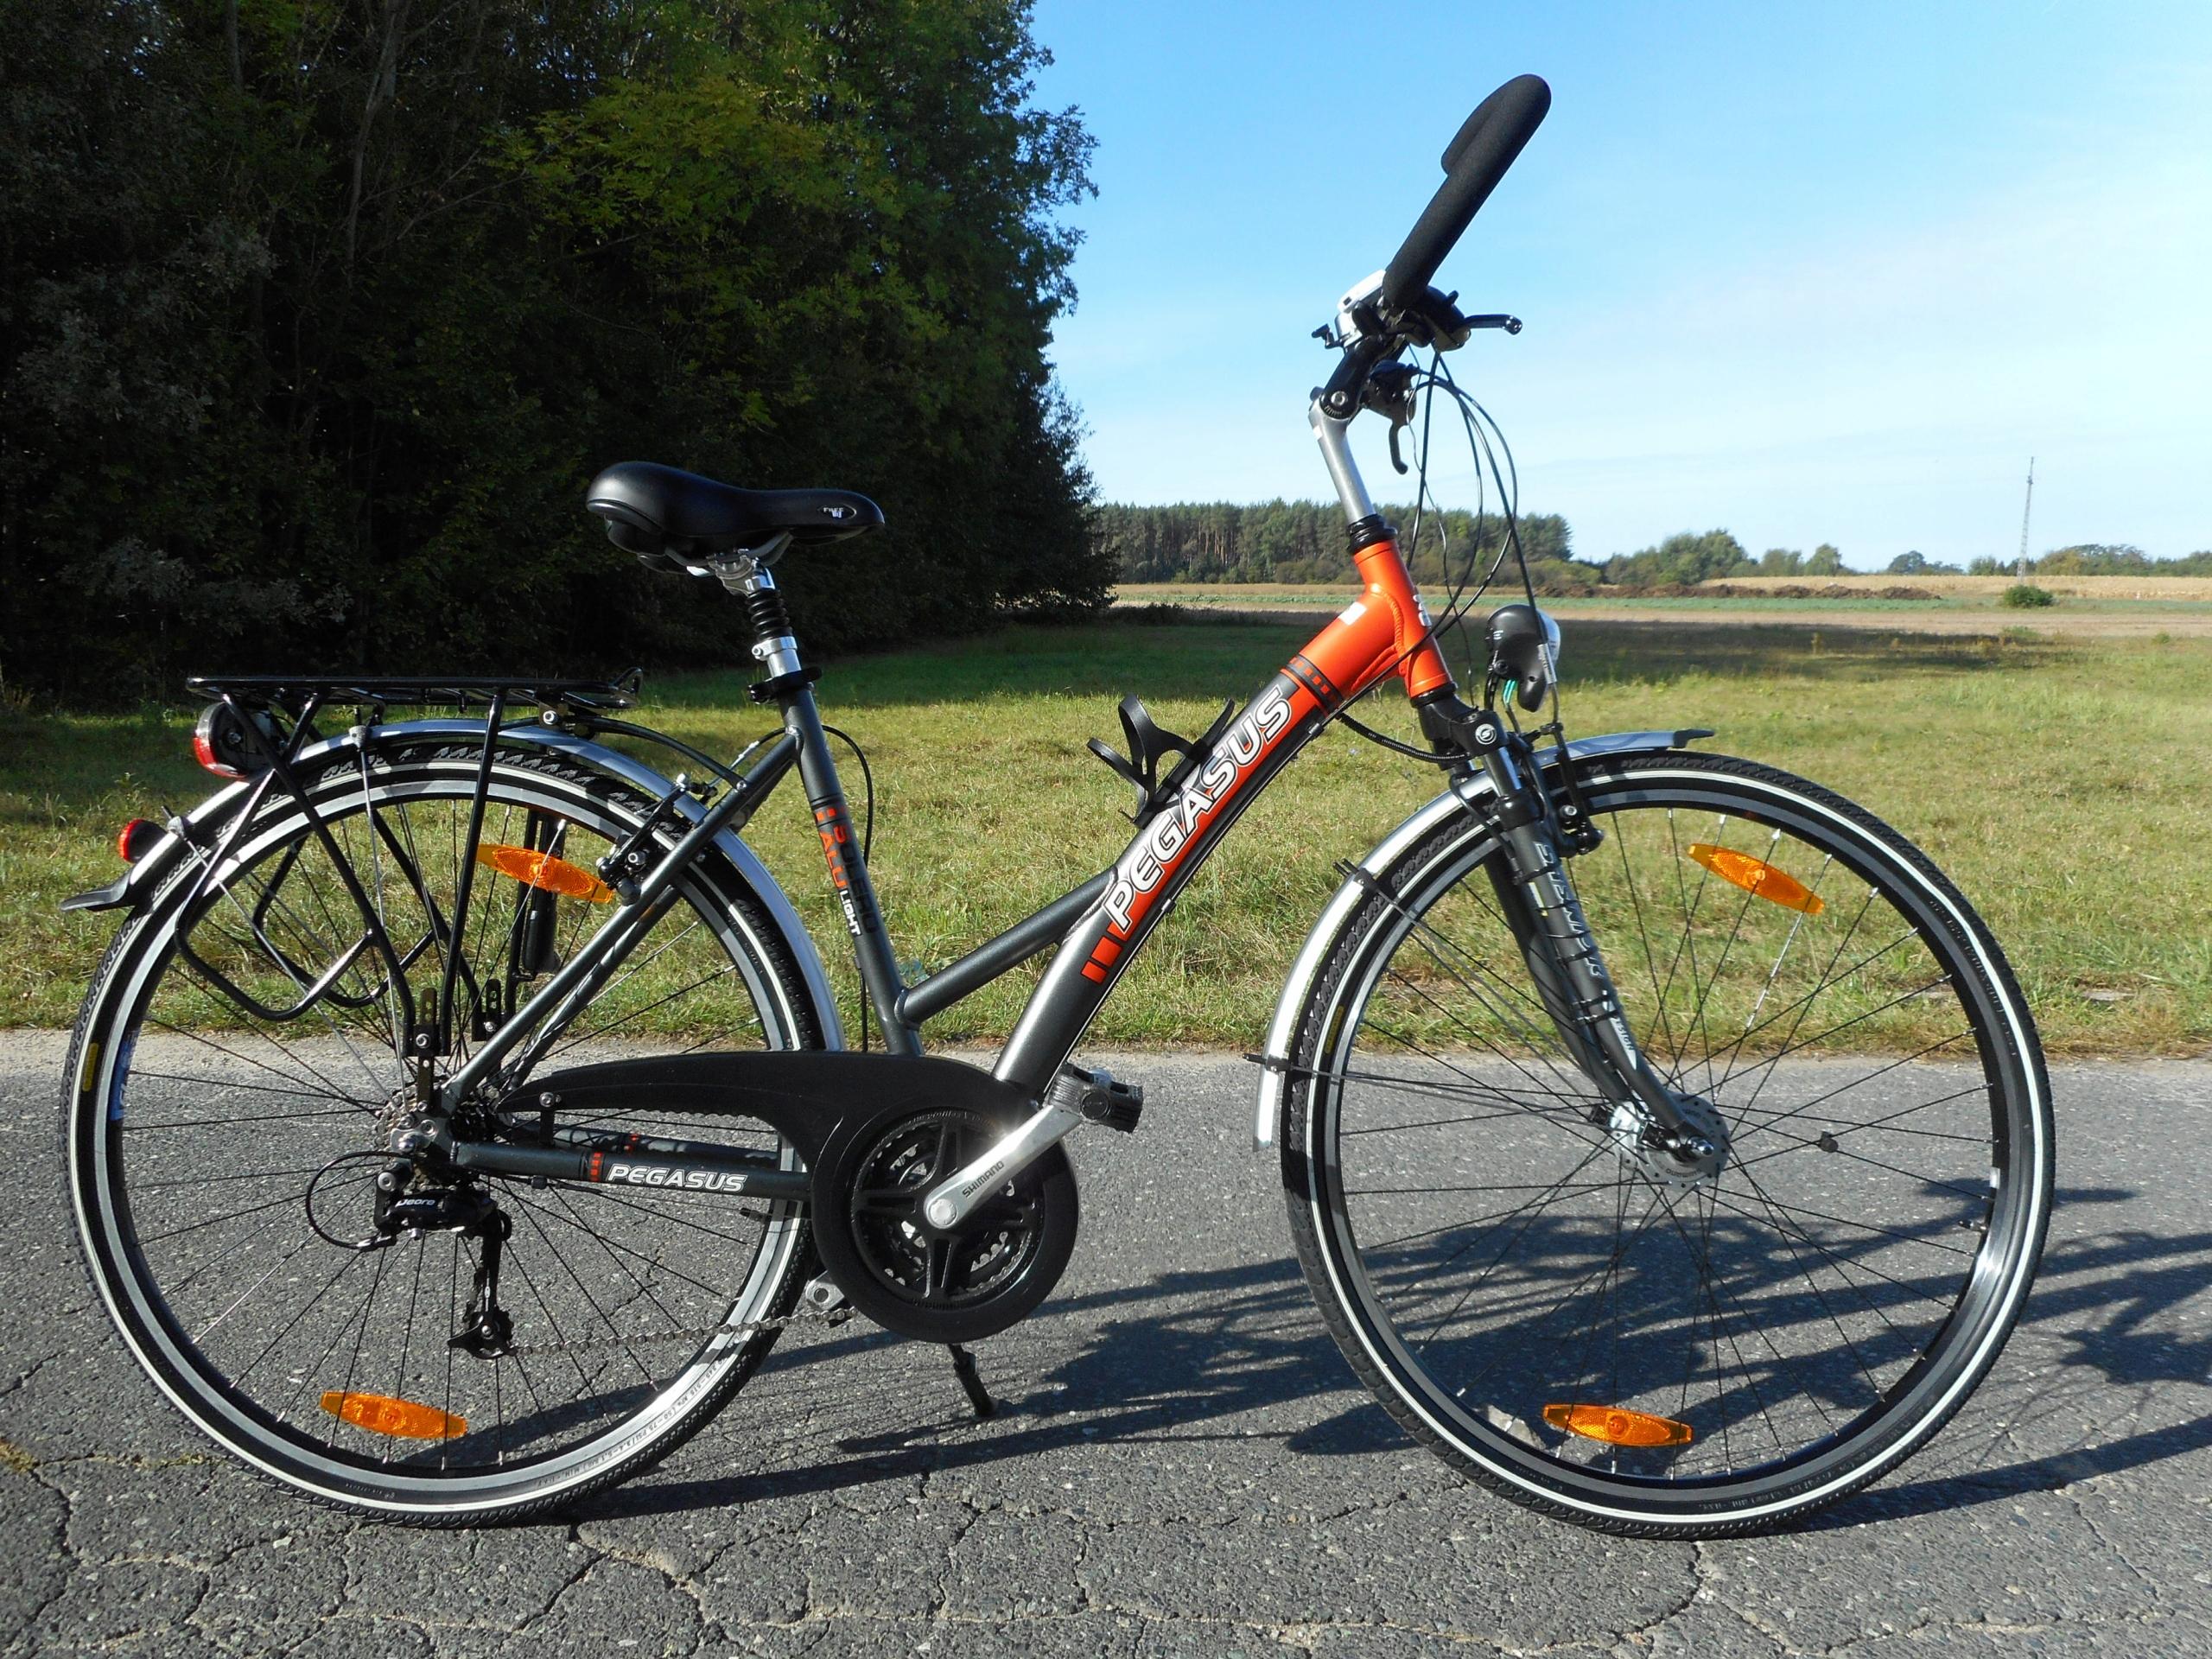 rower damka PEGASUS koła 28 21 biegów aluminiowa